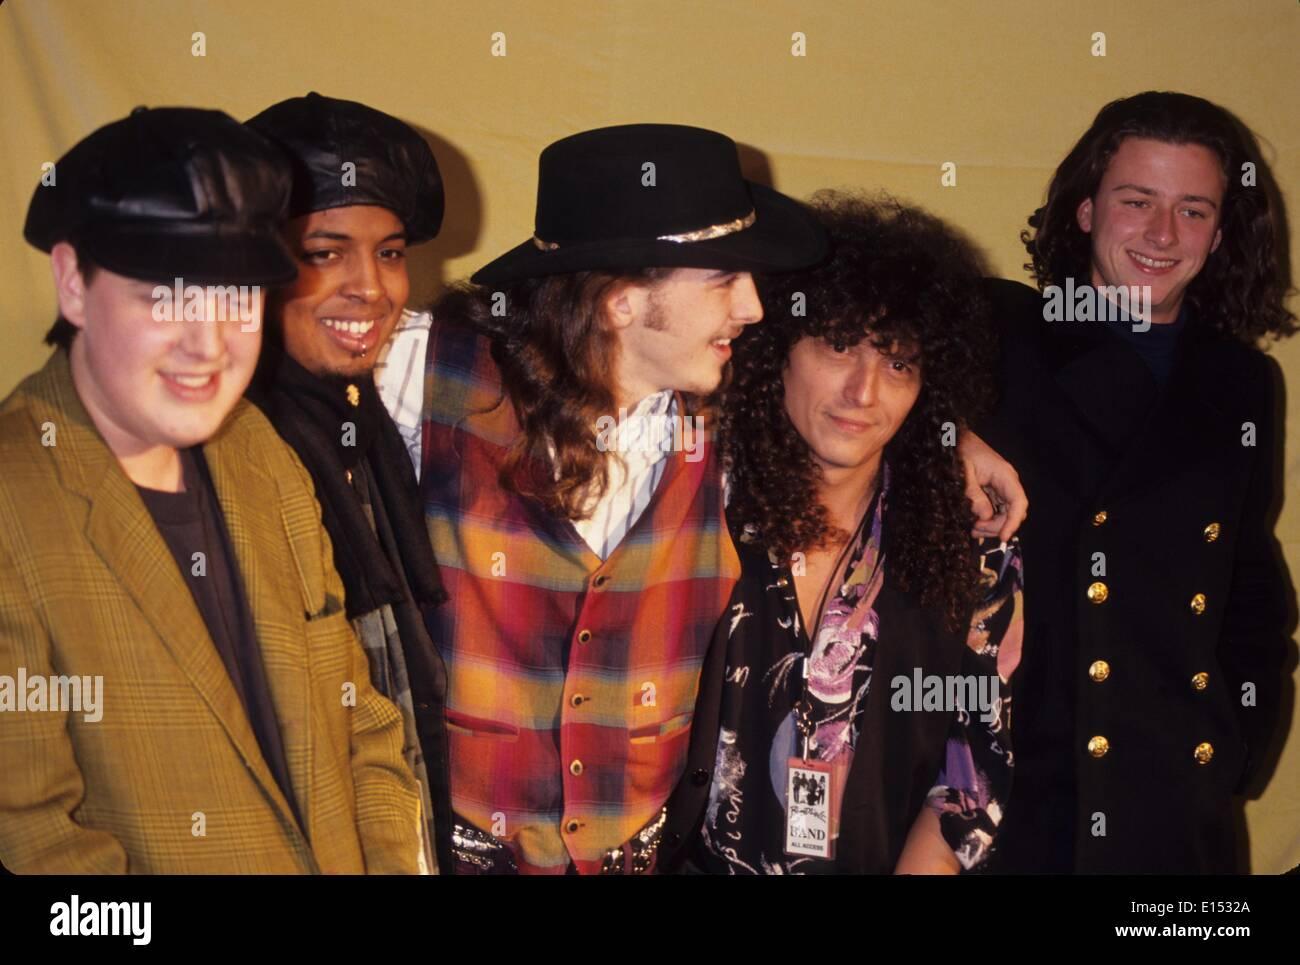 BLOODLINE.P'CES Grace foundation 1992.l4310.(Credit Image: © Stephen Trupp/Globe Photos/ZUMAPRESS.com) - Stock Image